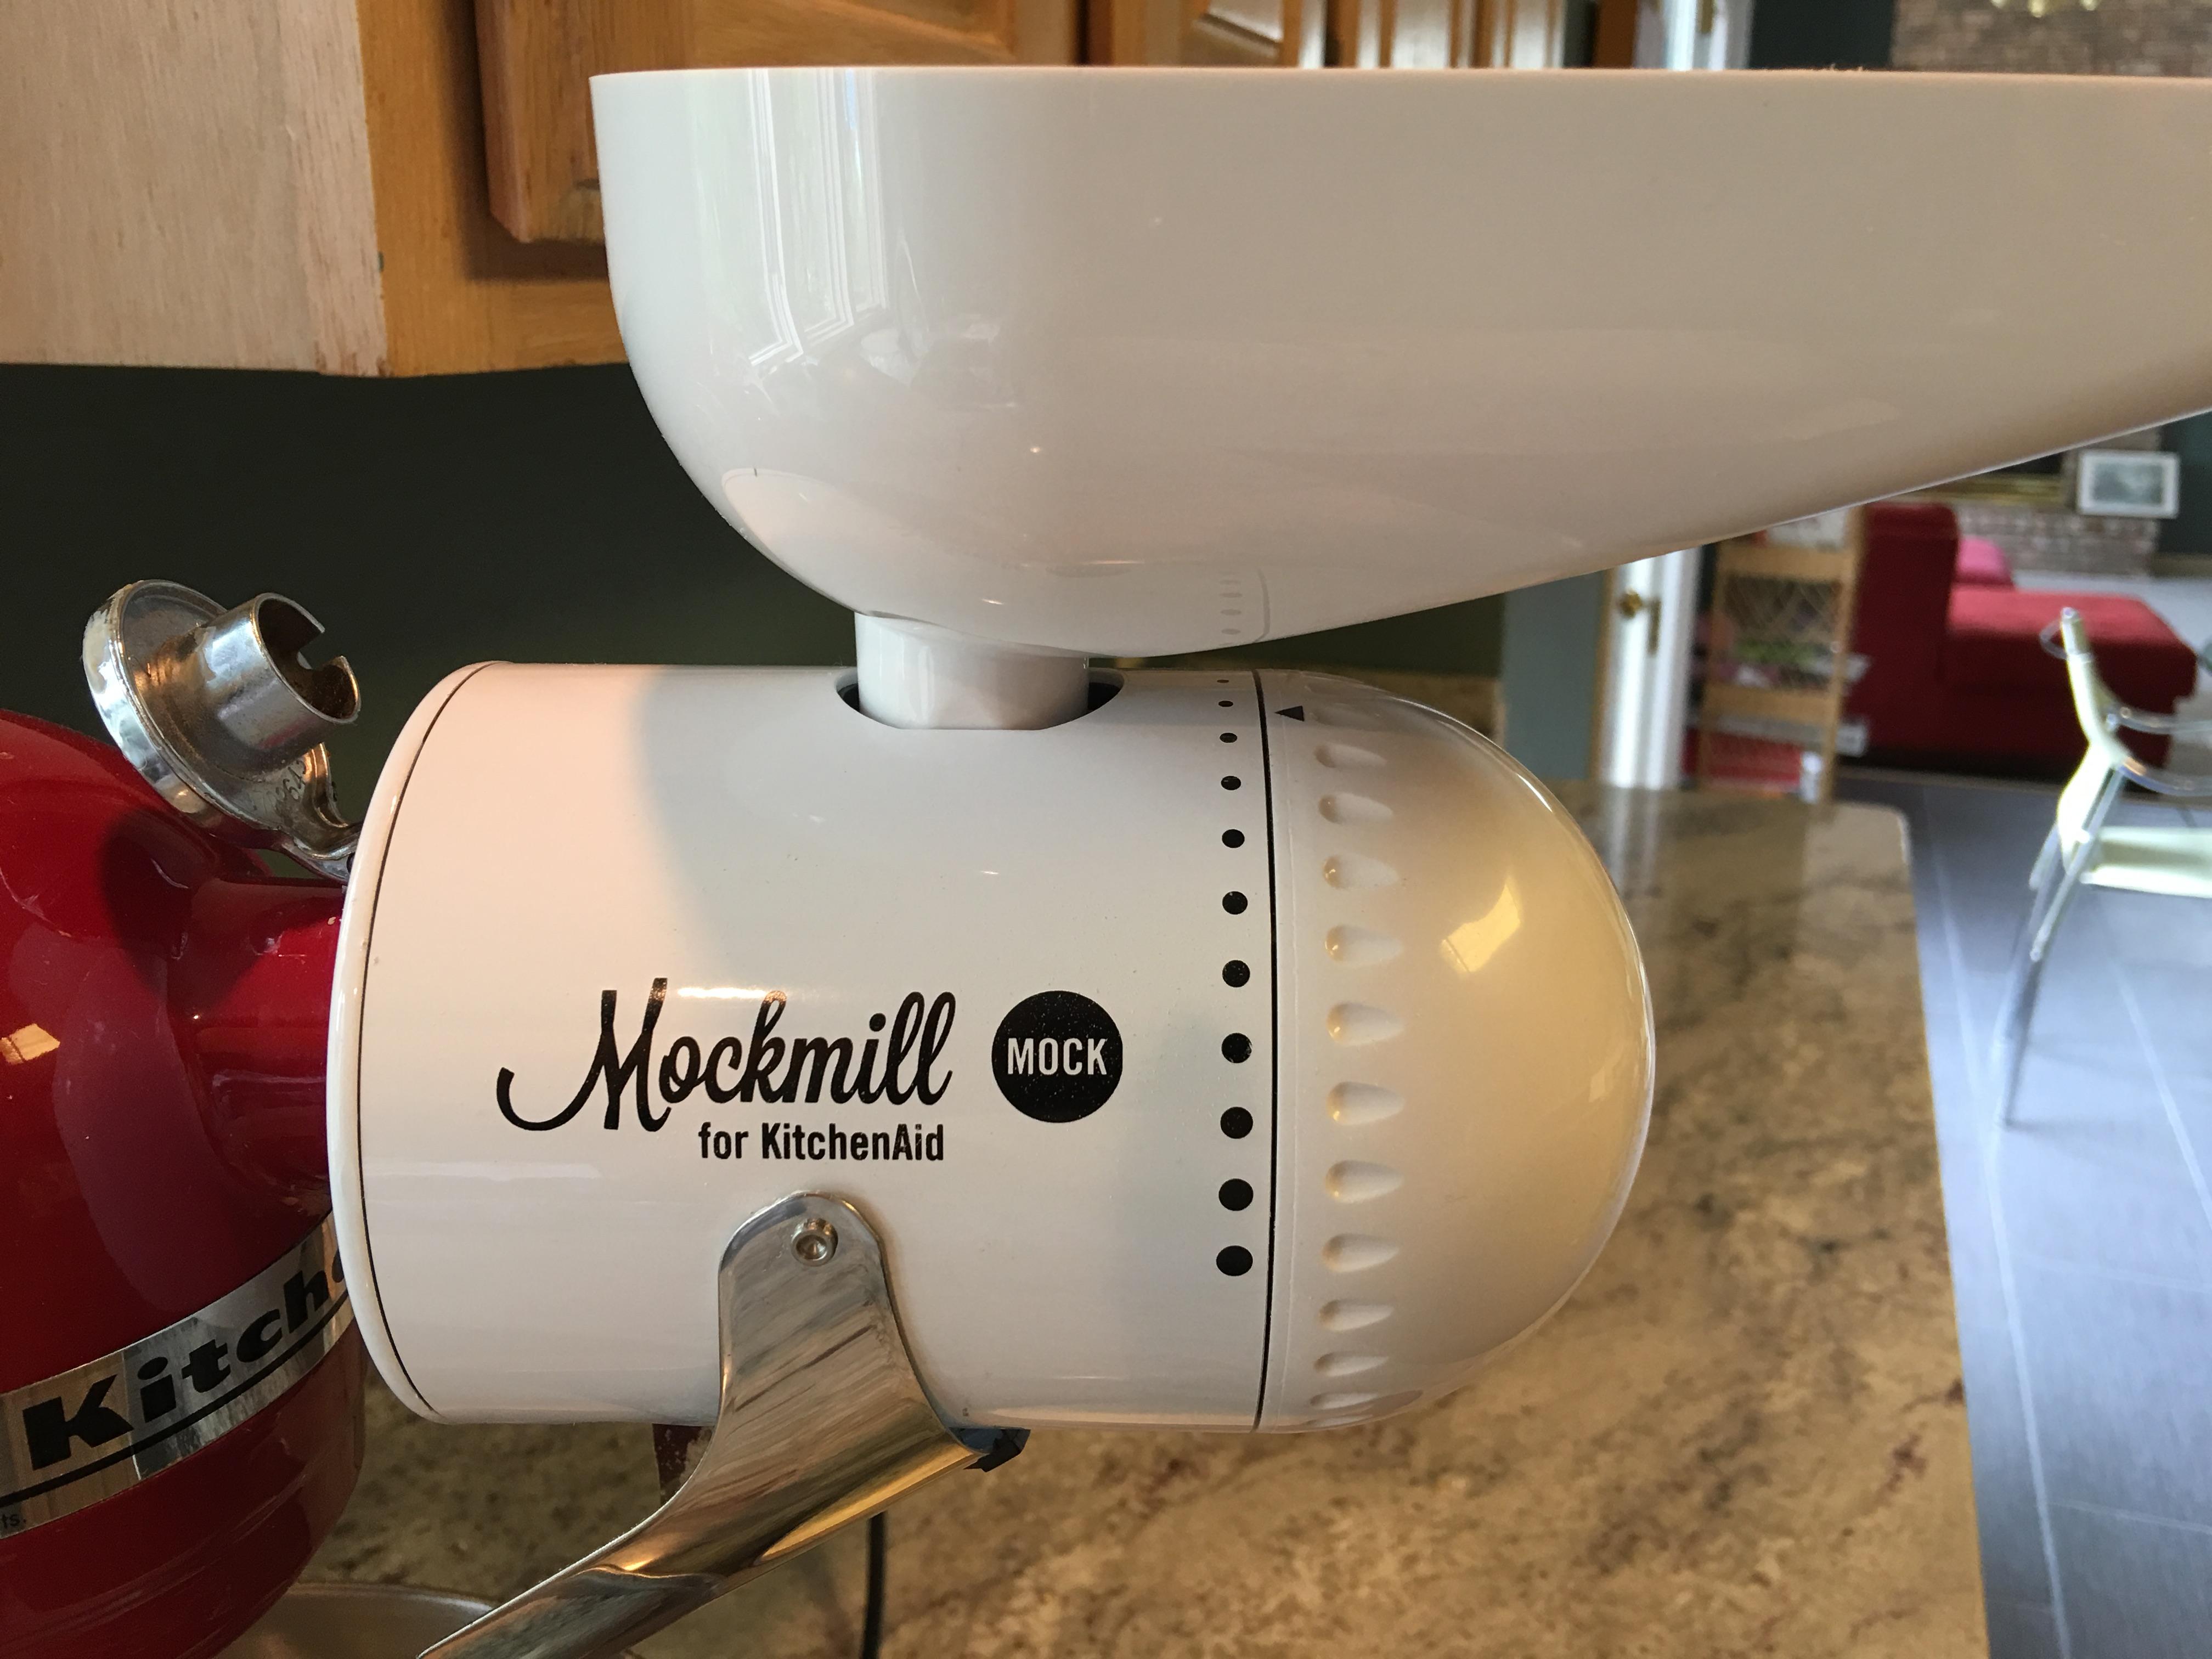 Mockmill Grain Mill for Kitchen Aid